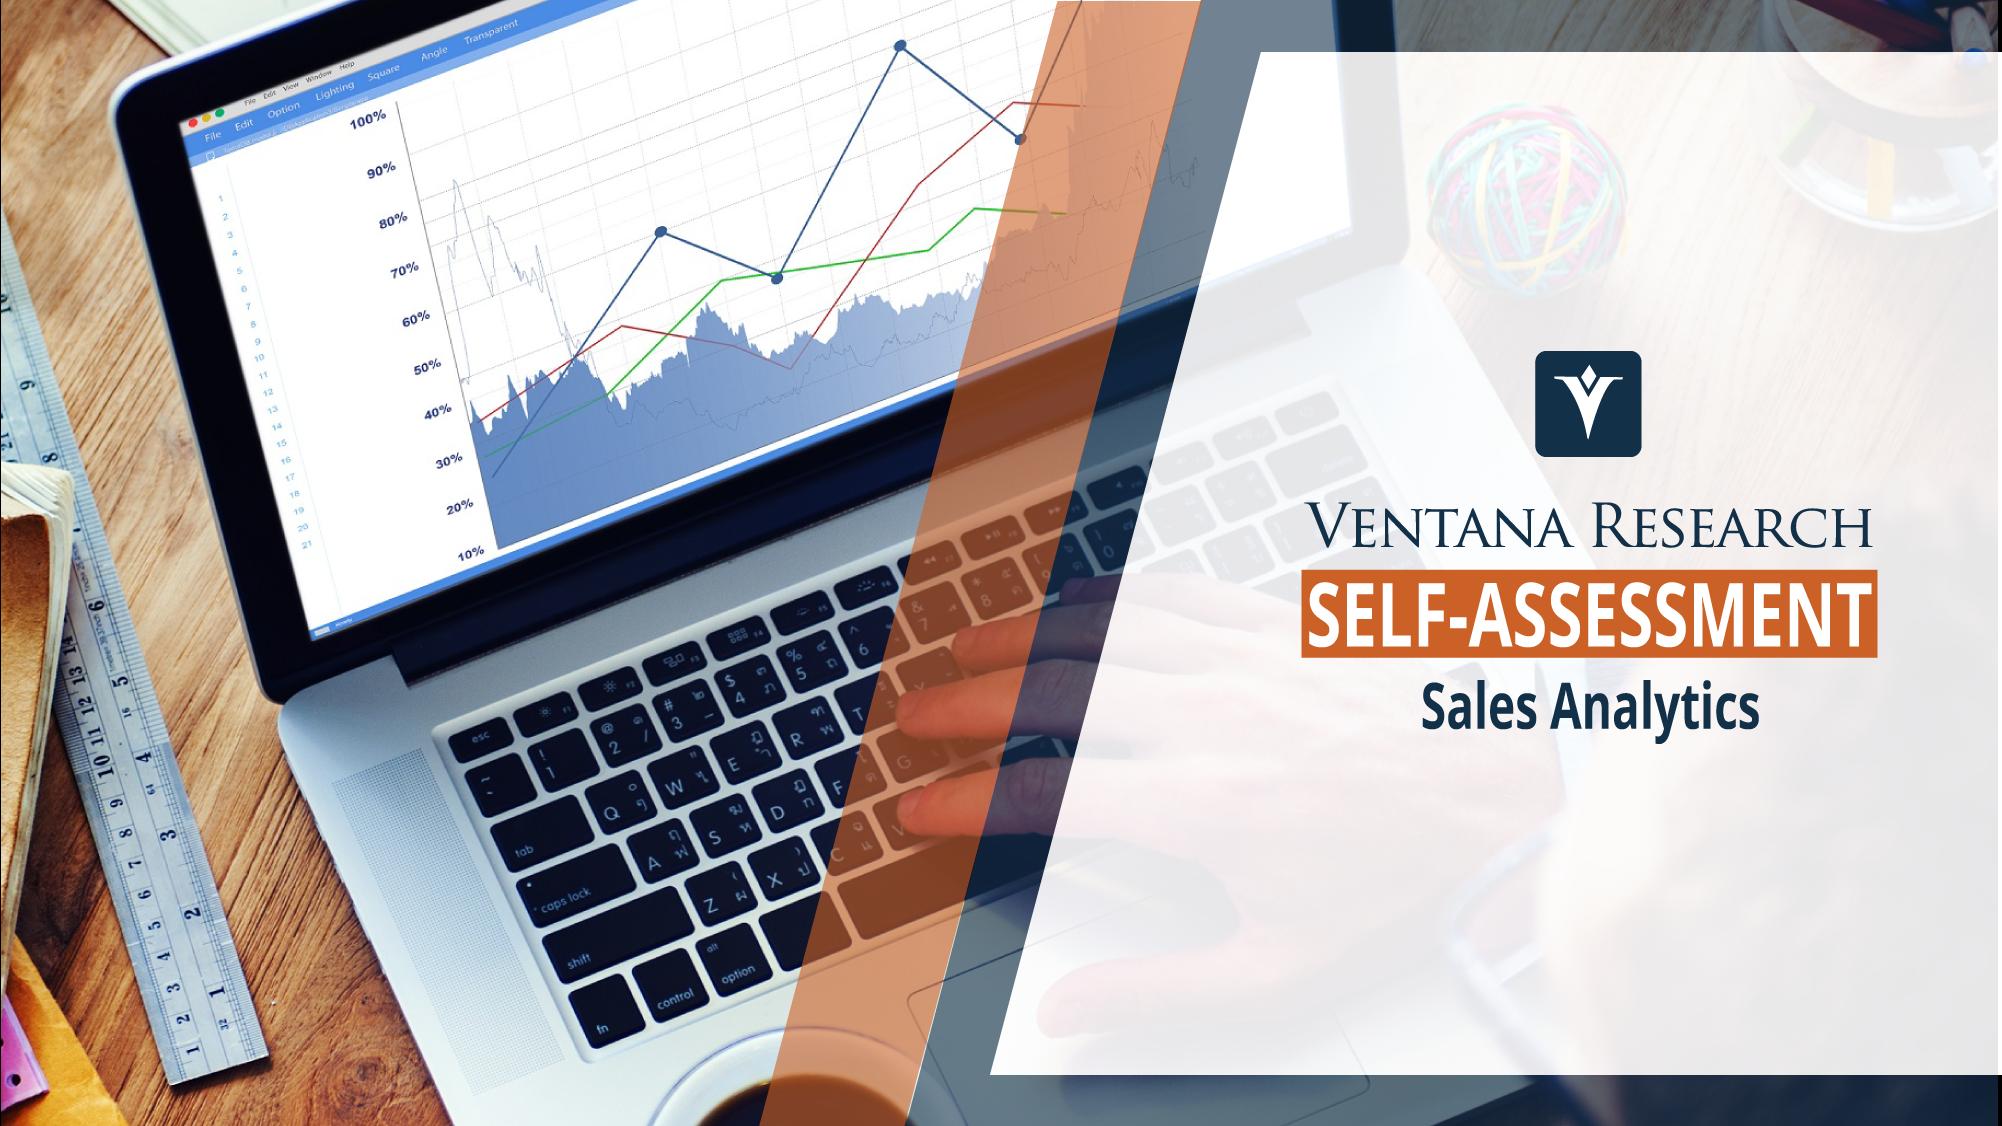 Optymyze-Sales-Analytics-Self-Assessment.jpg